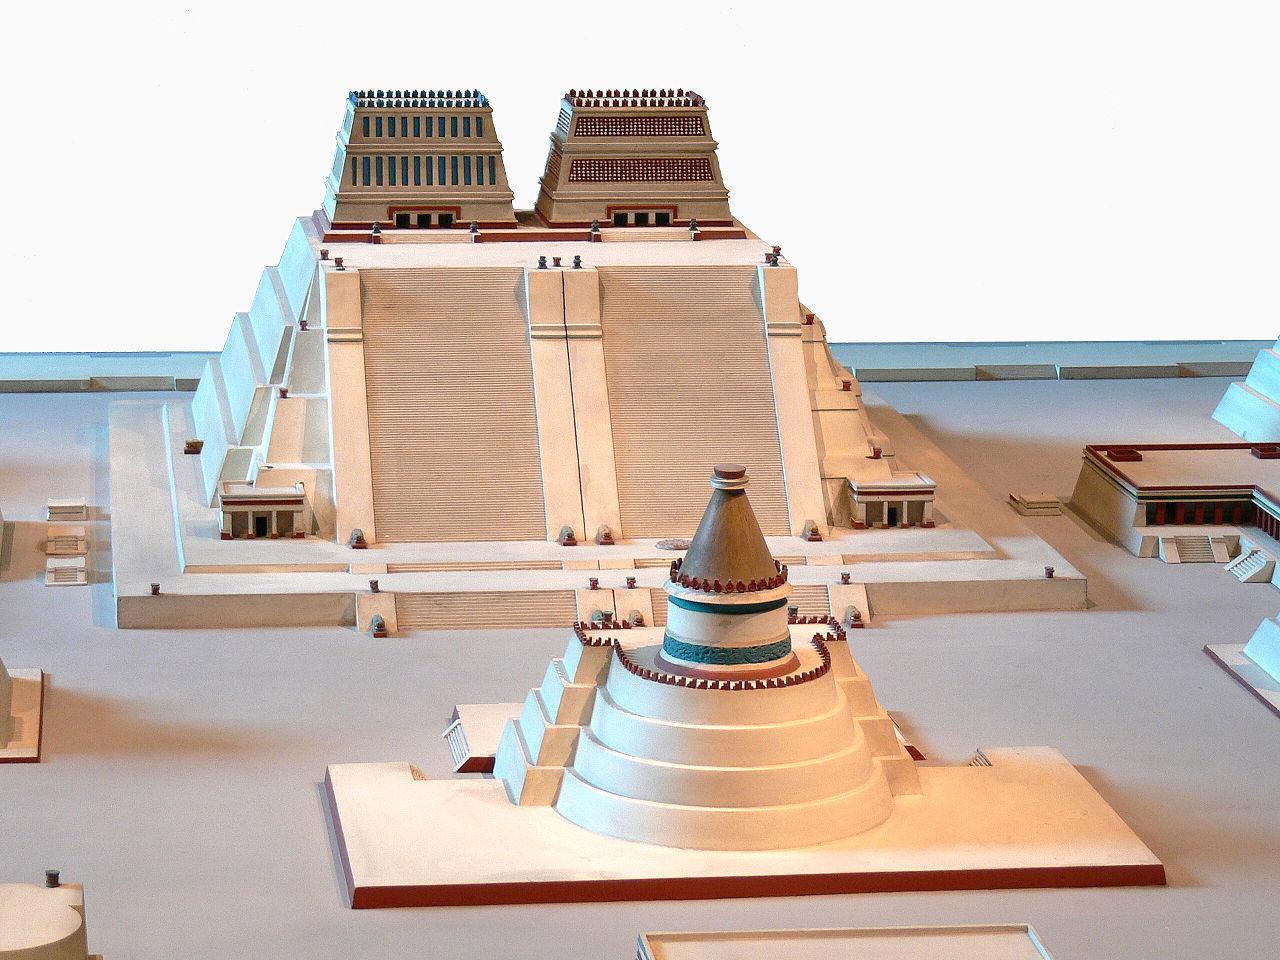 Reconstruction du Templo Mayor de Tenochtitlan